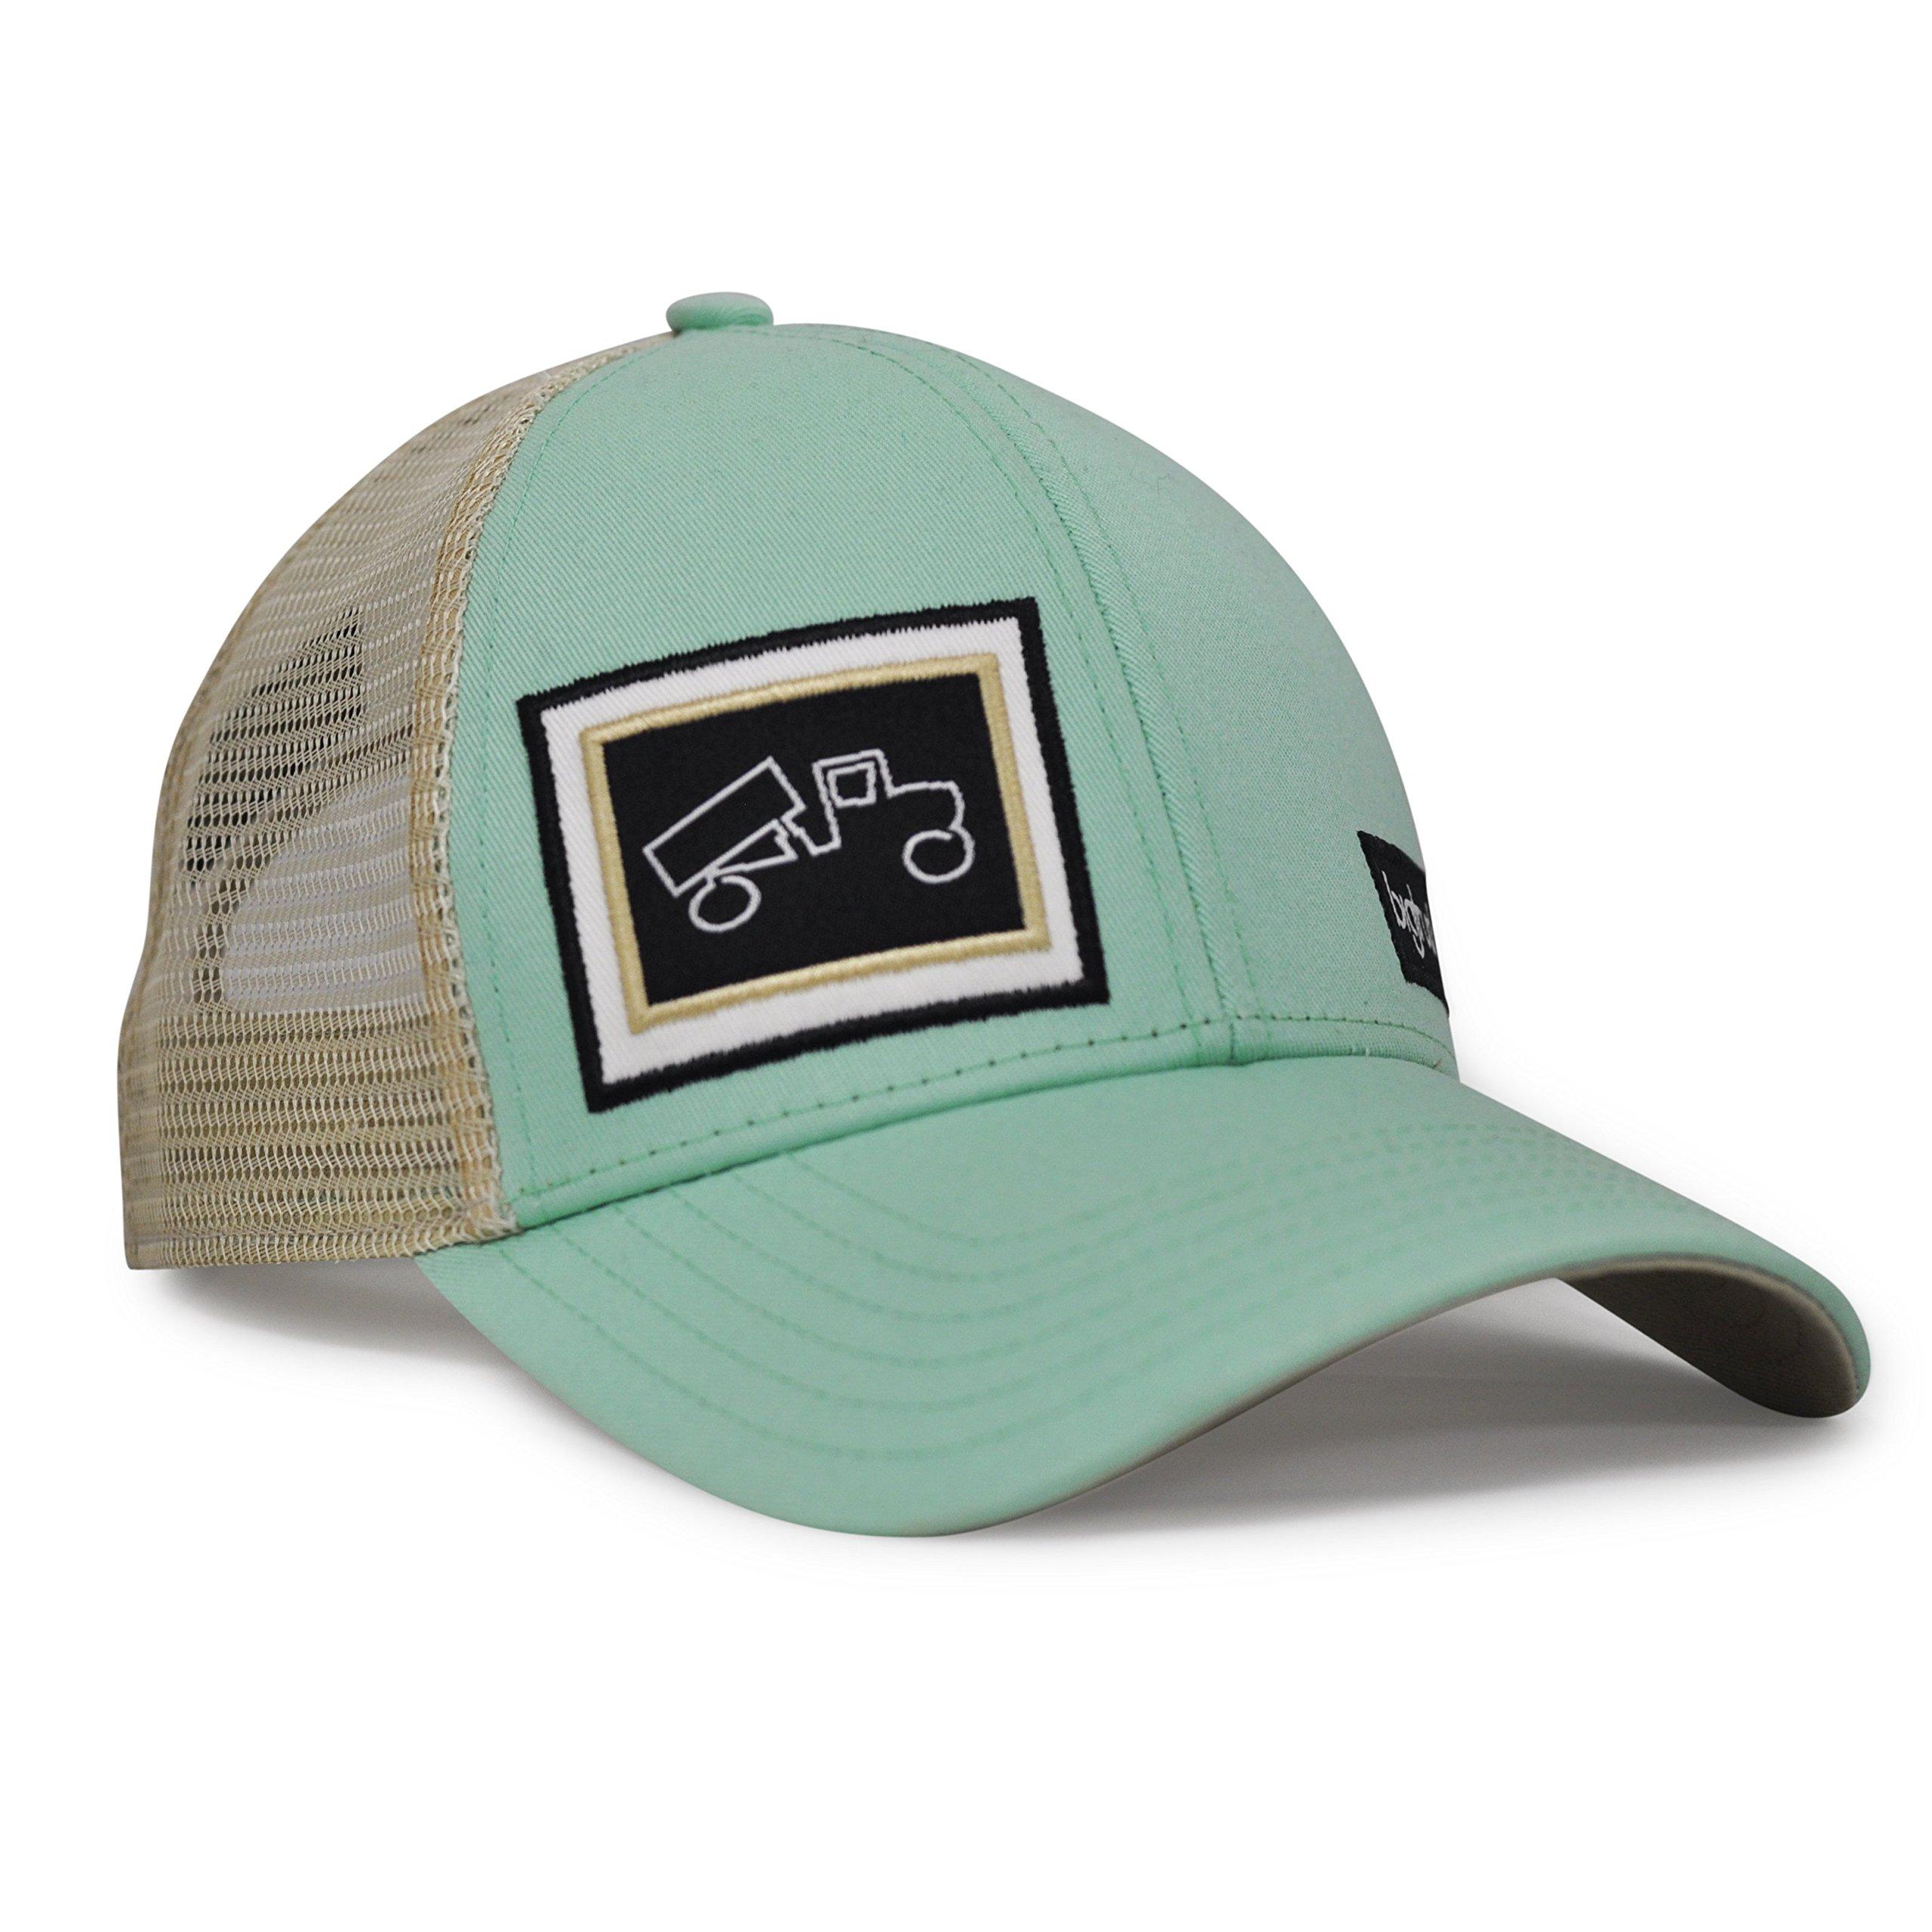 bigtruck Mint Classic Trucker Hat, Mint, 58cm